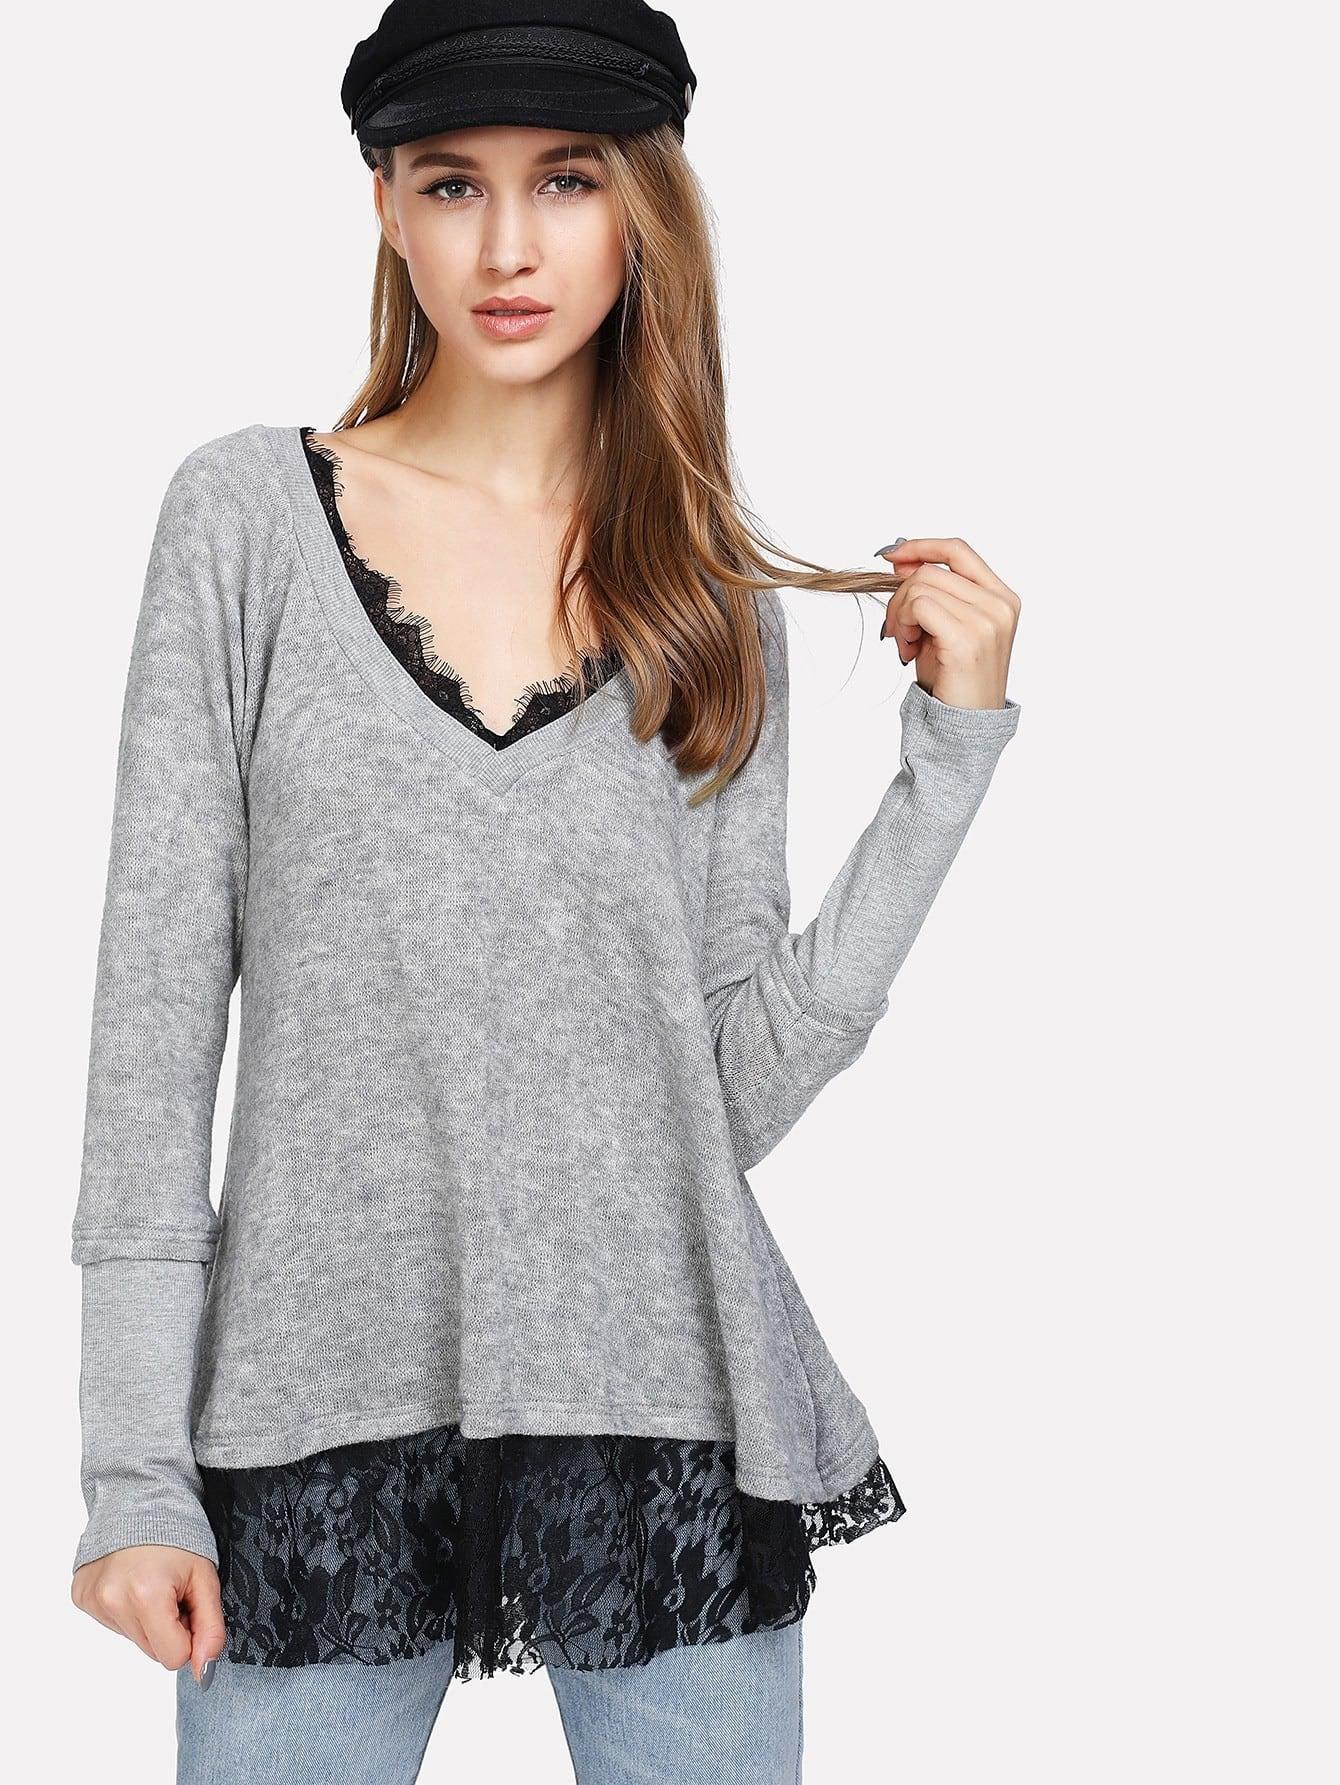 Lace Hem Raglan Sleeve Marled Knit Tee raglan sleeve marled knit dress